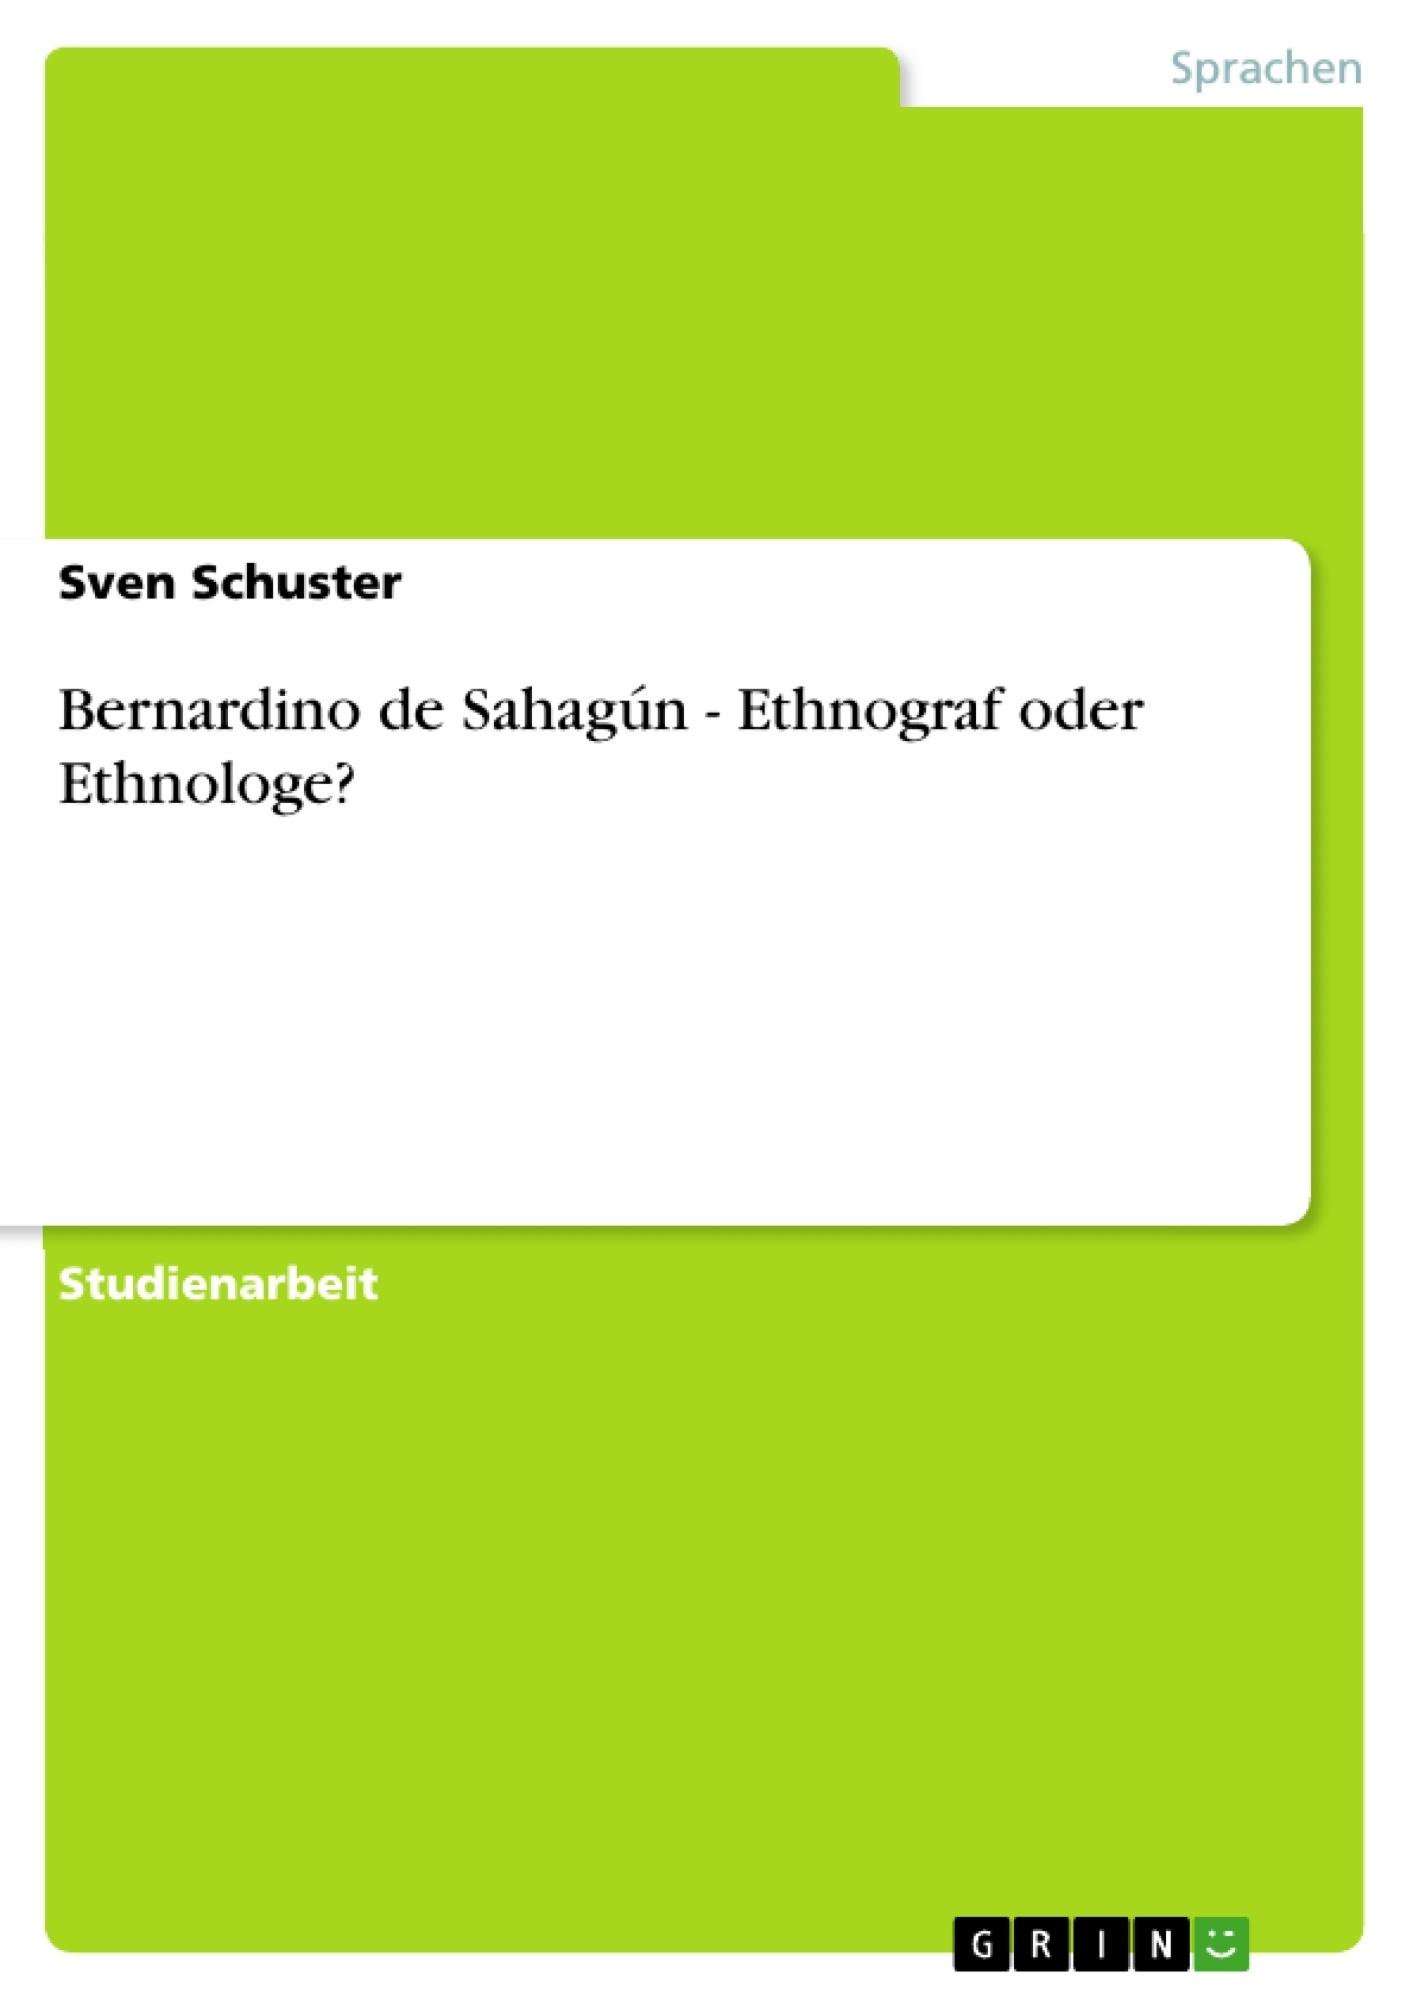 Titel: Bernardino de Sahagún - Ethnograf oder Ethnologe?